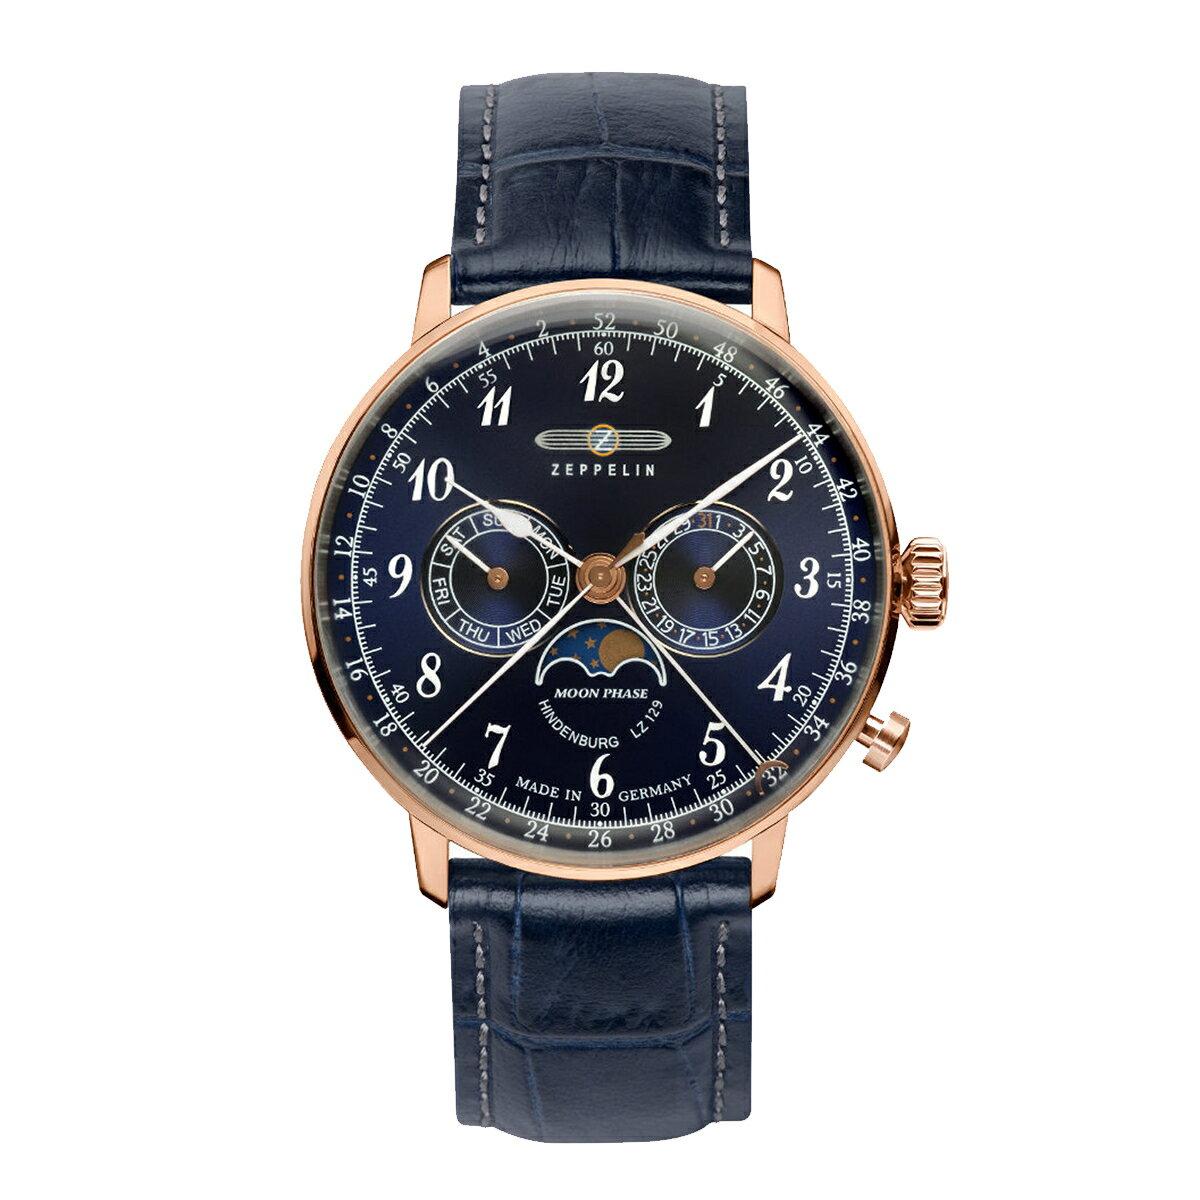 ZEPPELIN ツェッペリン 7039-3 メンズ 時計 腕時計 プレゼント ギフト 贈り物[あす楽]